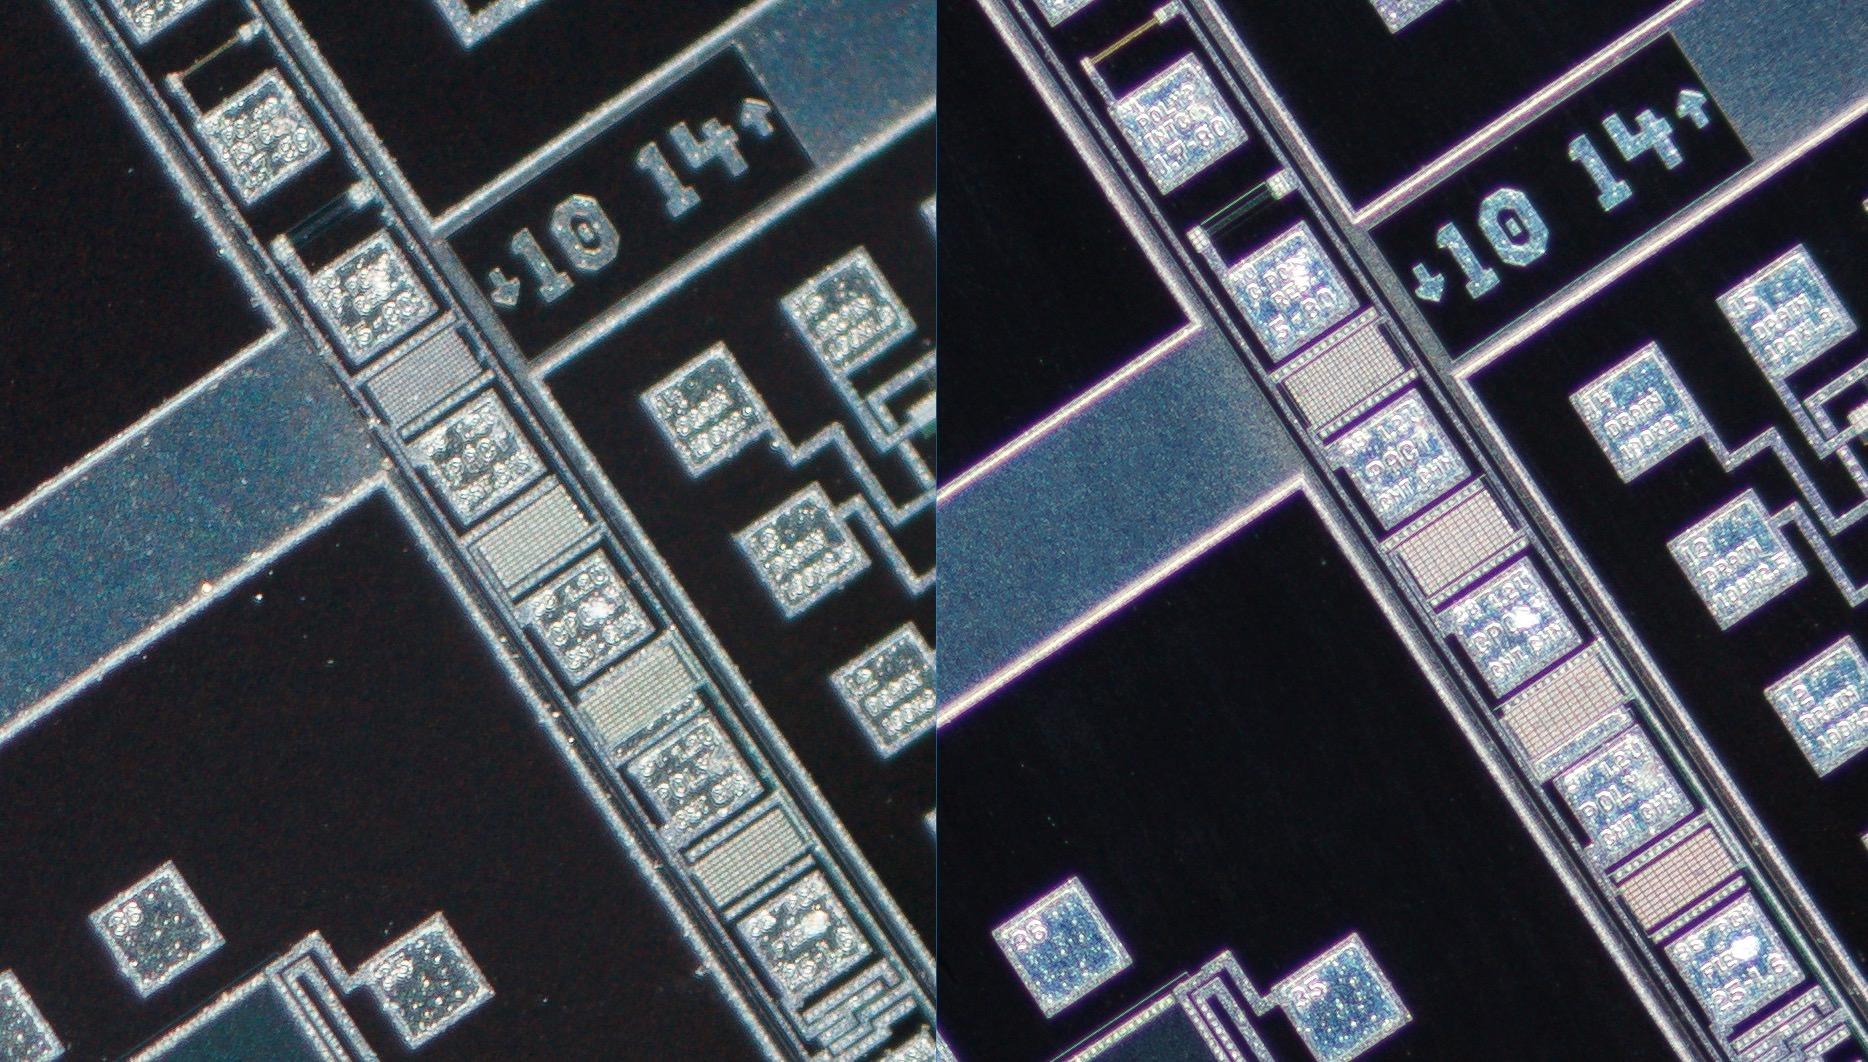 Lomo 3.7x 0.11   Microscope Objective vs   Nikon CFI Plan Fluor 4X/0.13 Microscope Objective vs 100% corner crop.Clicking on an image will open a larger version.